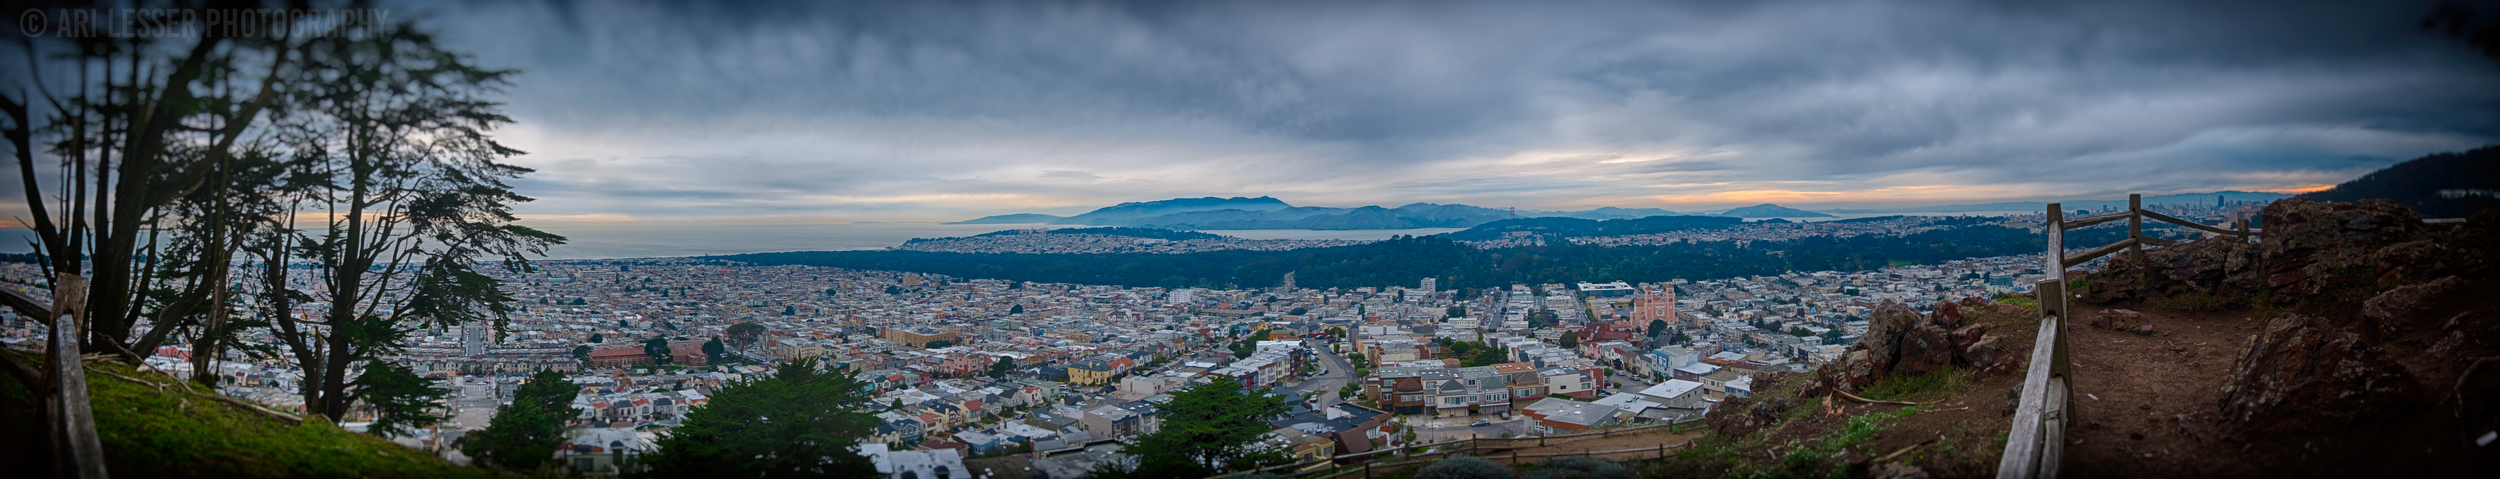 San Francisco Panoramic Shot